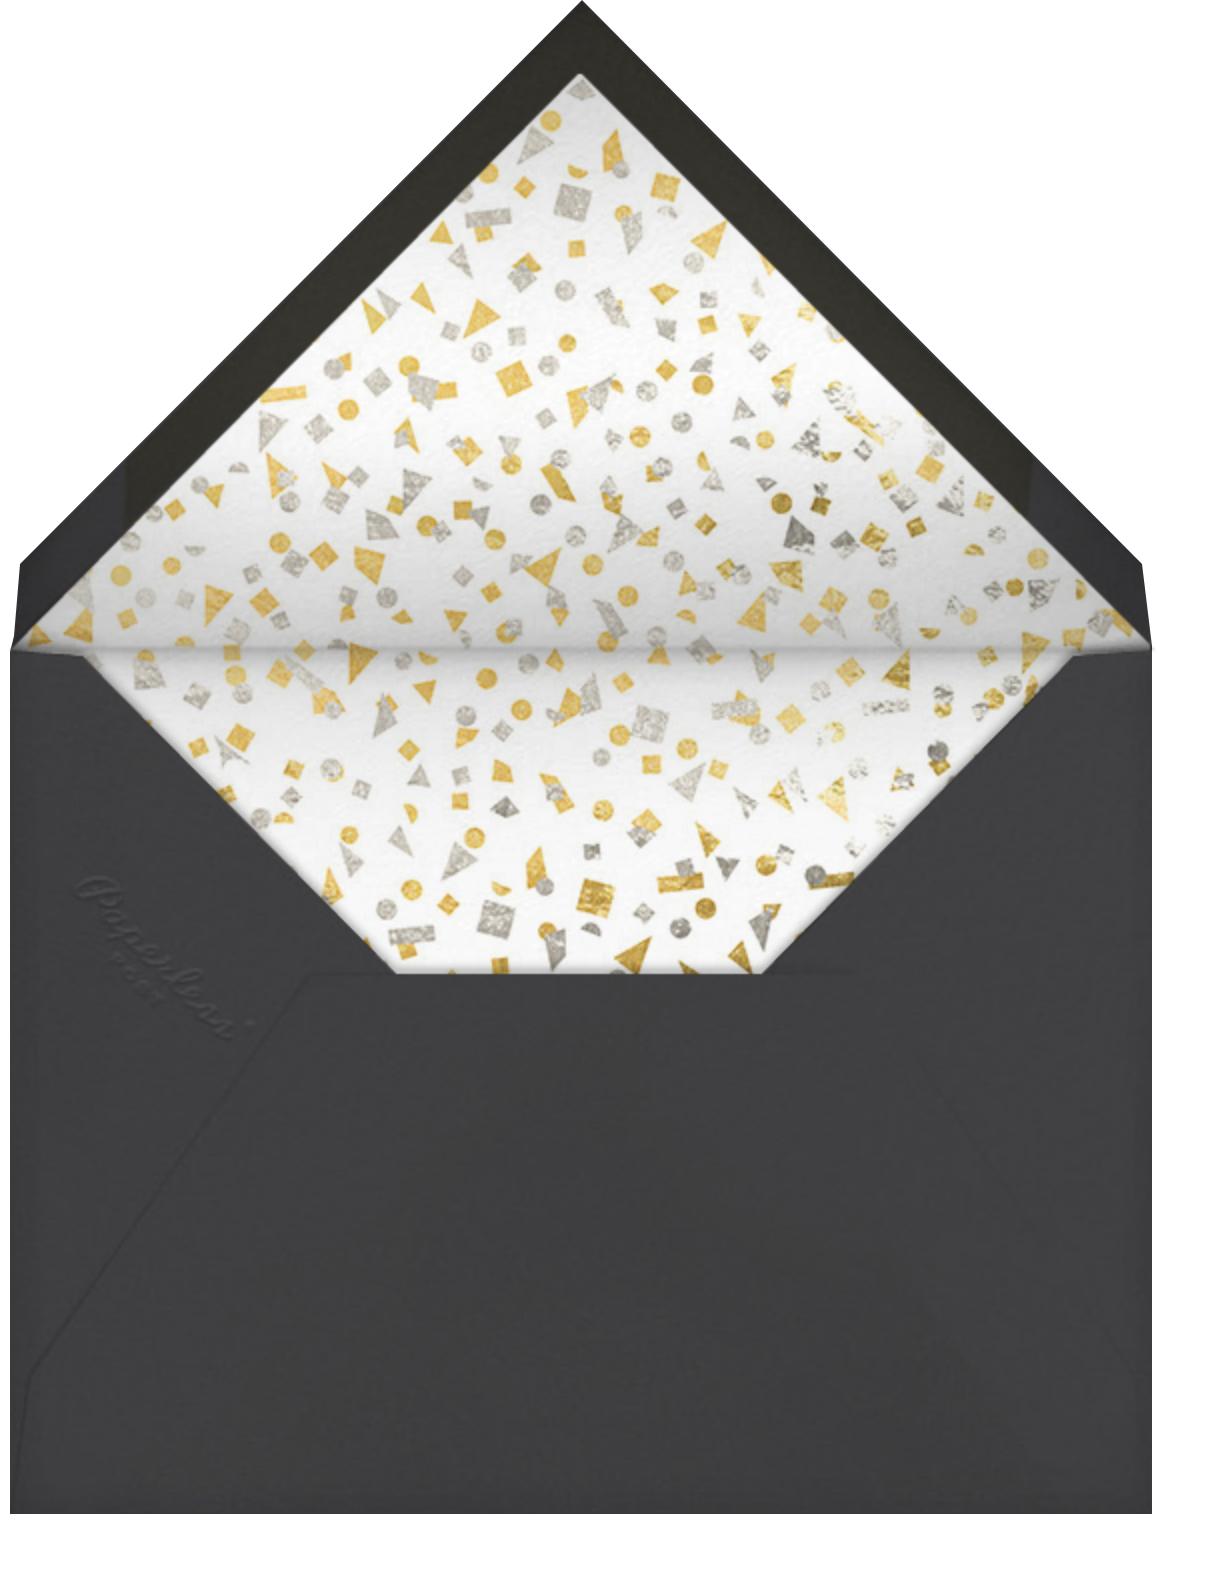 Eureka - Gold - Paperless Post - Graduation party - envelope back